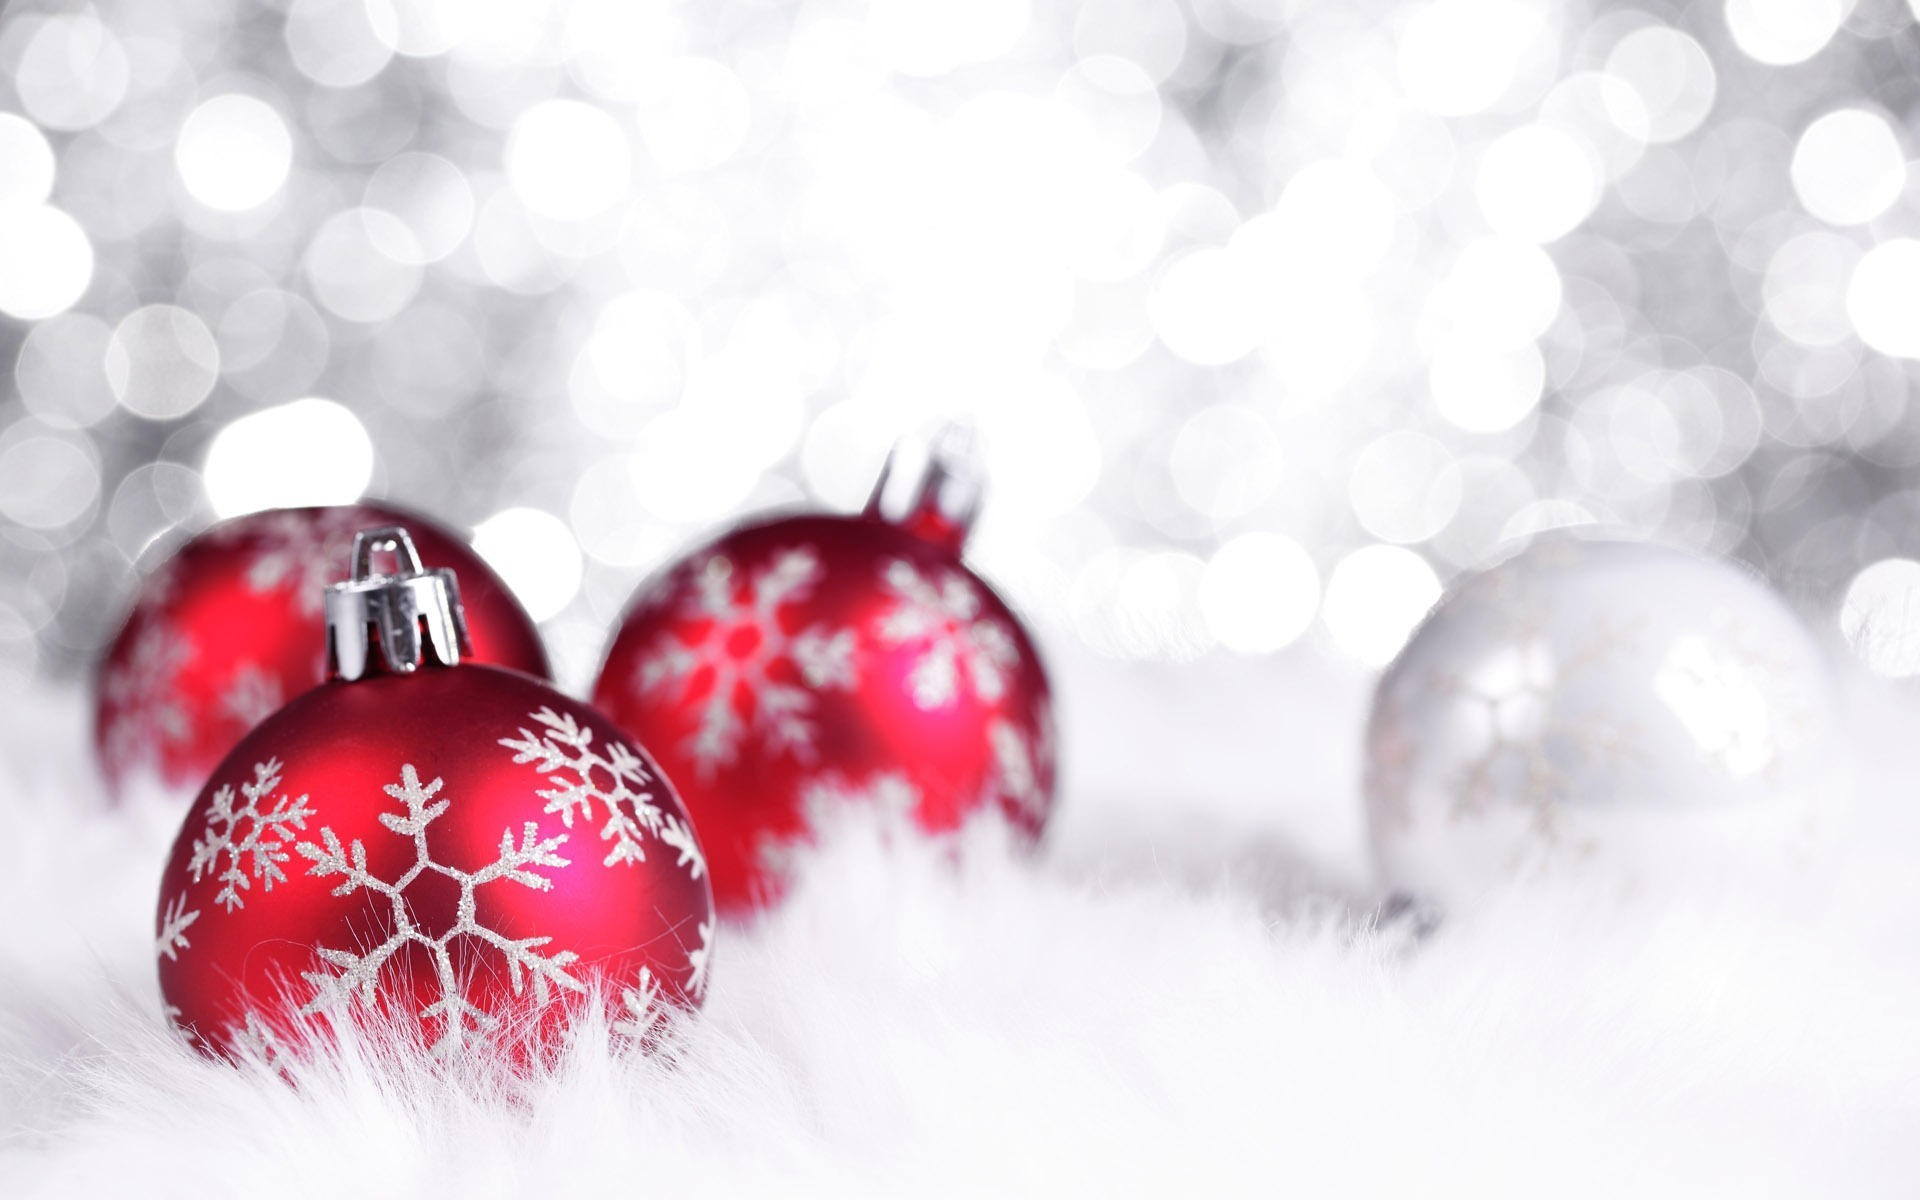 Christmas Holiday Background Christmas background images